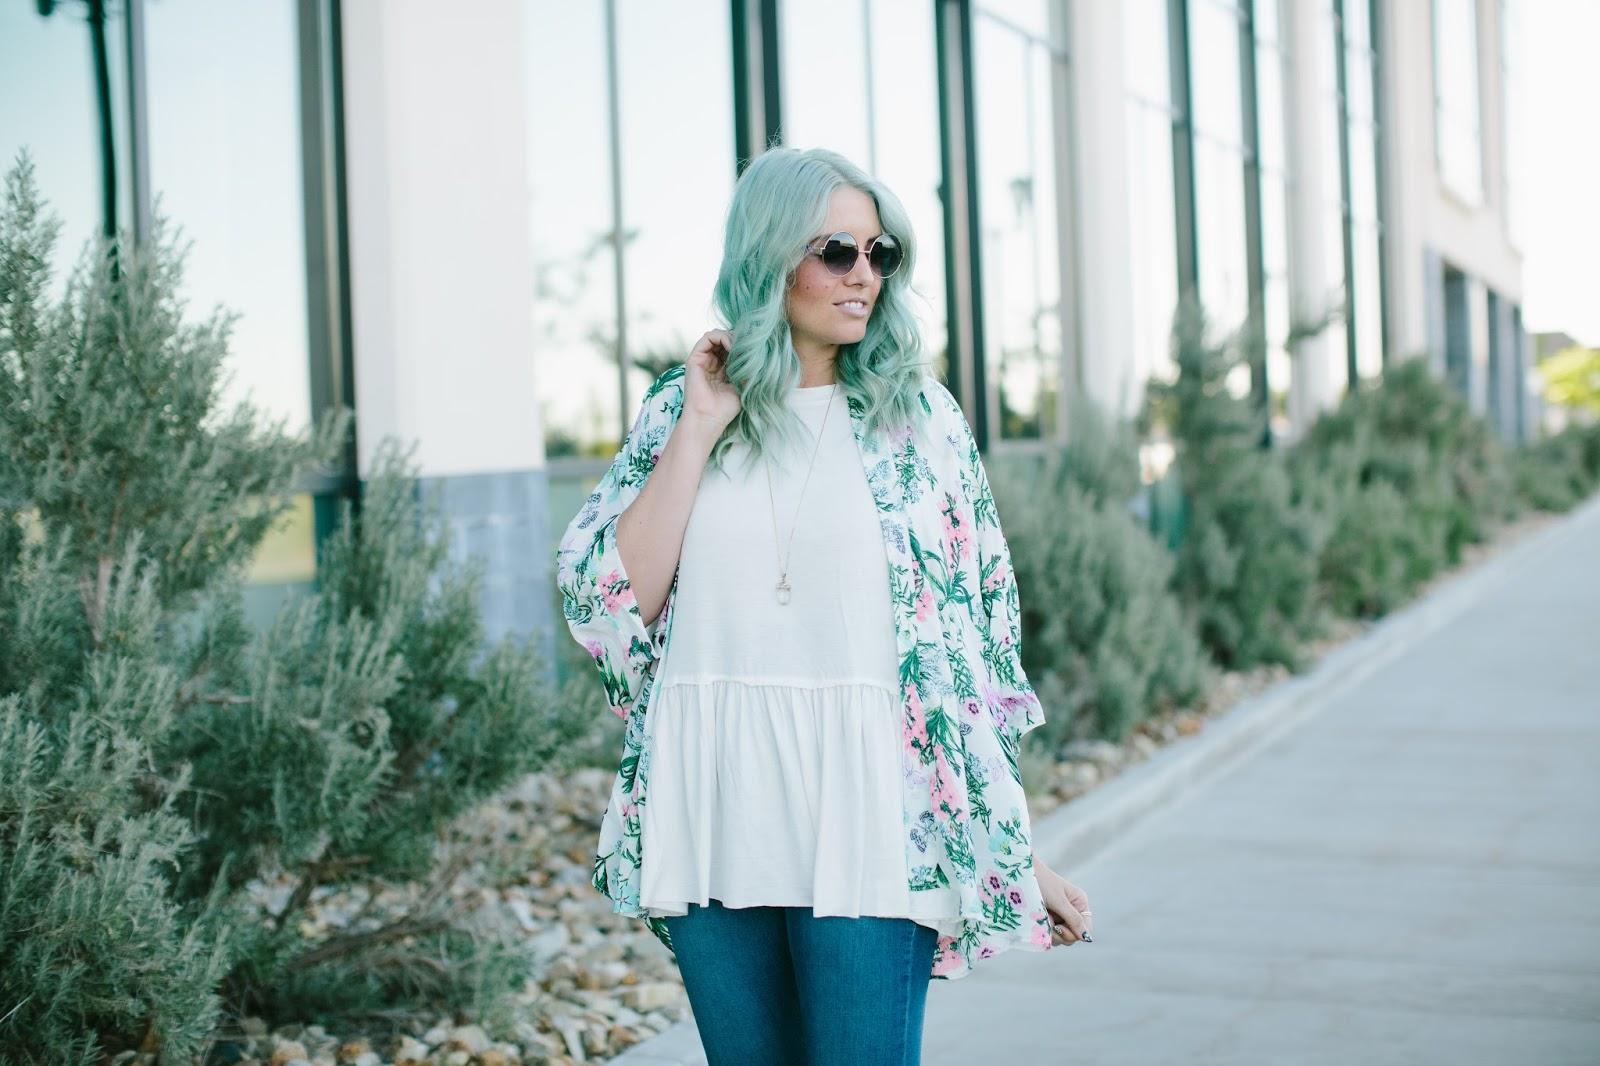 BAHAMAS FLORAL PRINT KIMONO JACKET, Utah Fashion Blogger,